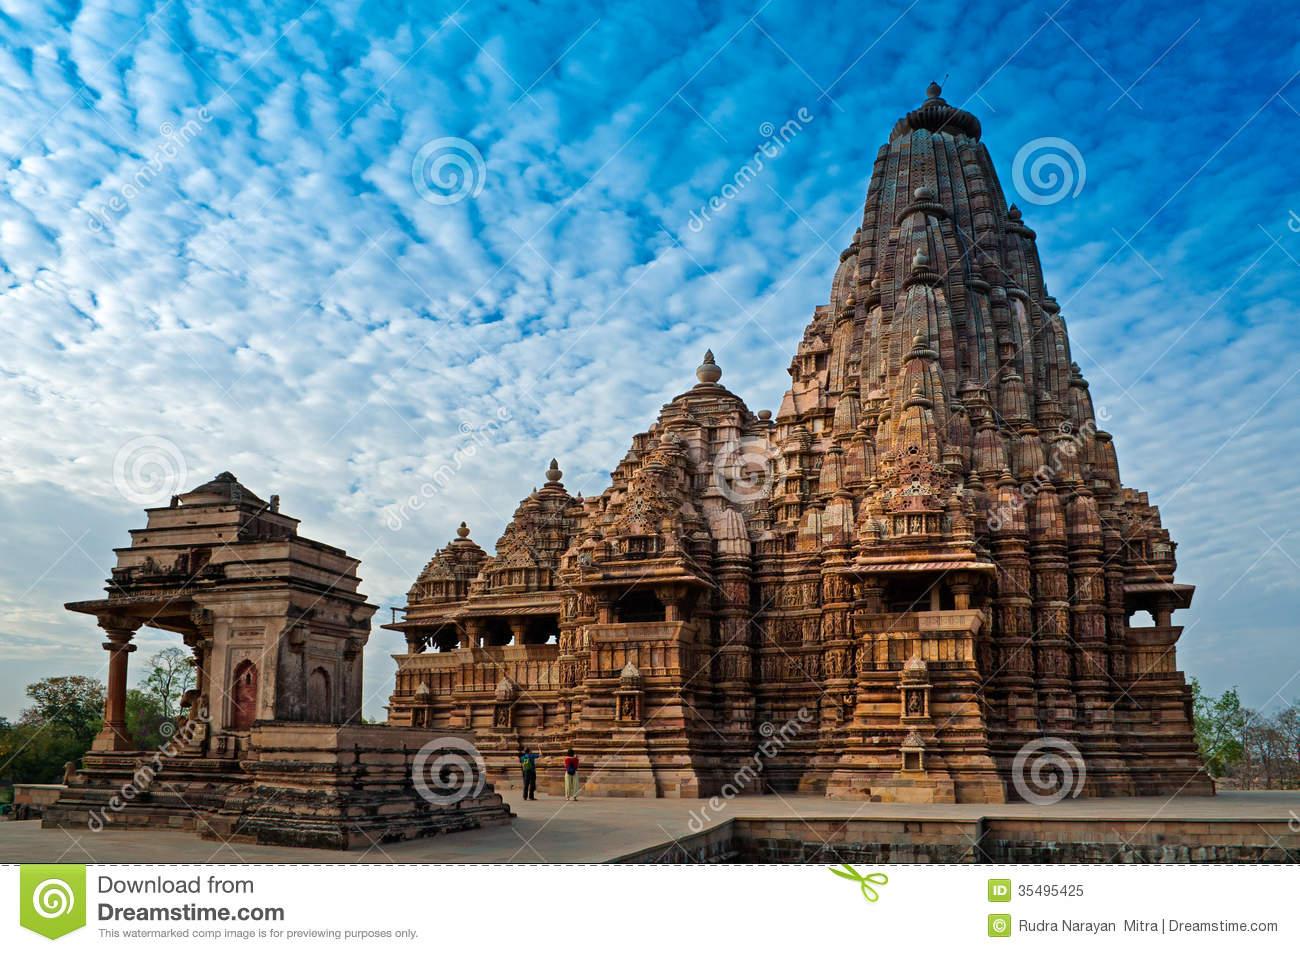 Kandariya Mahadeva Temple, Khajuraho, India,UNESCO Heritage Site.